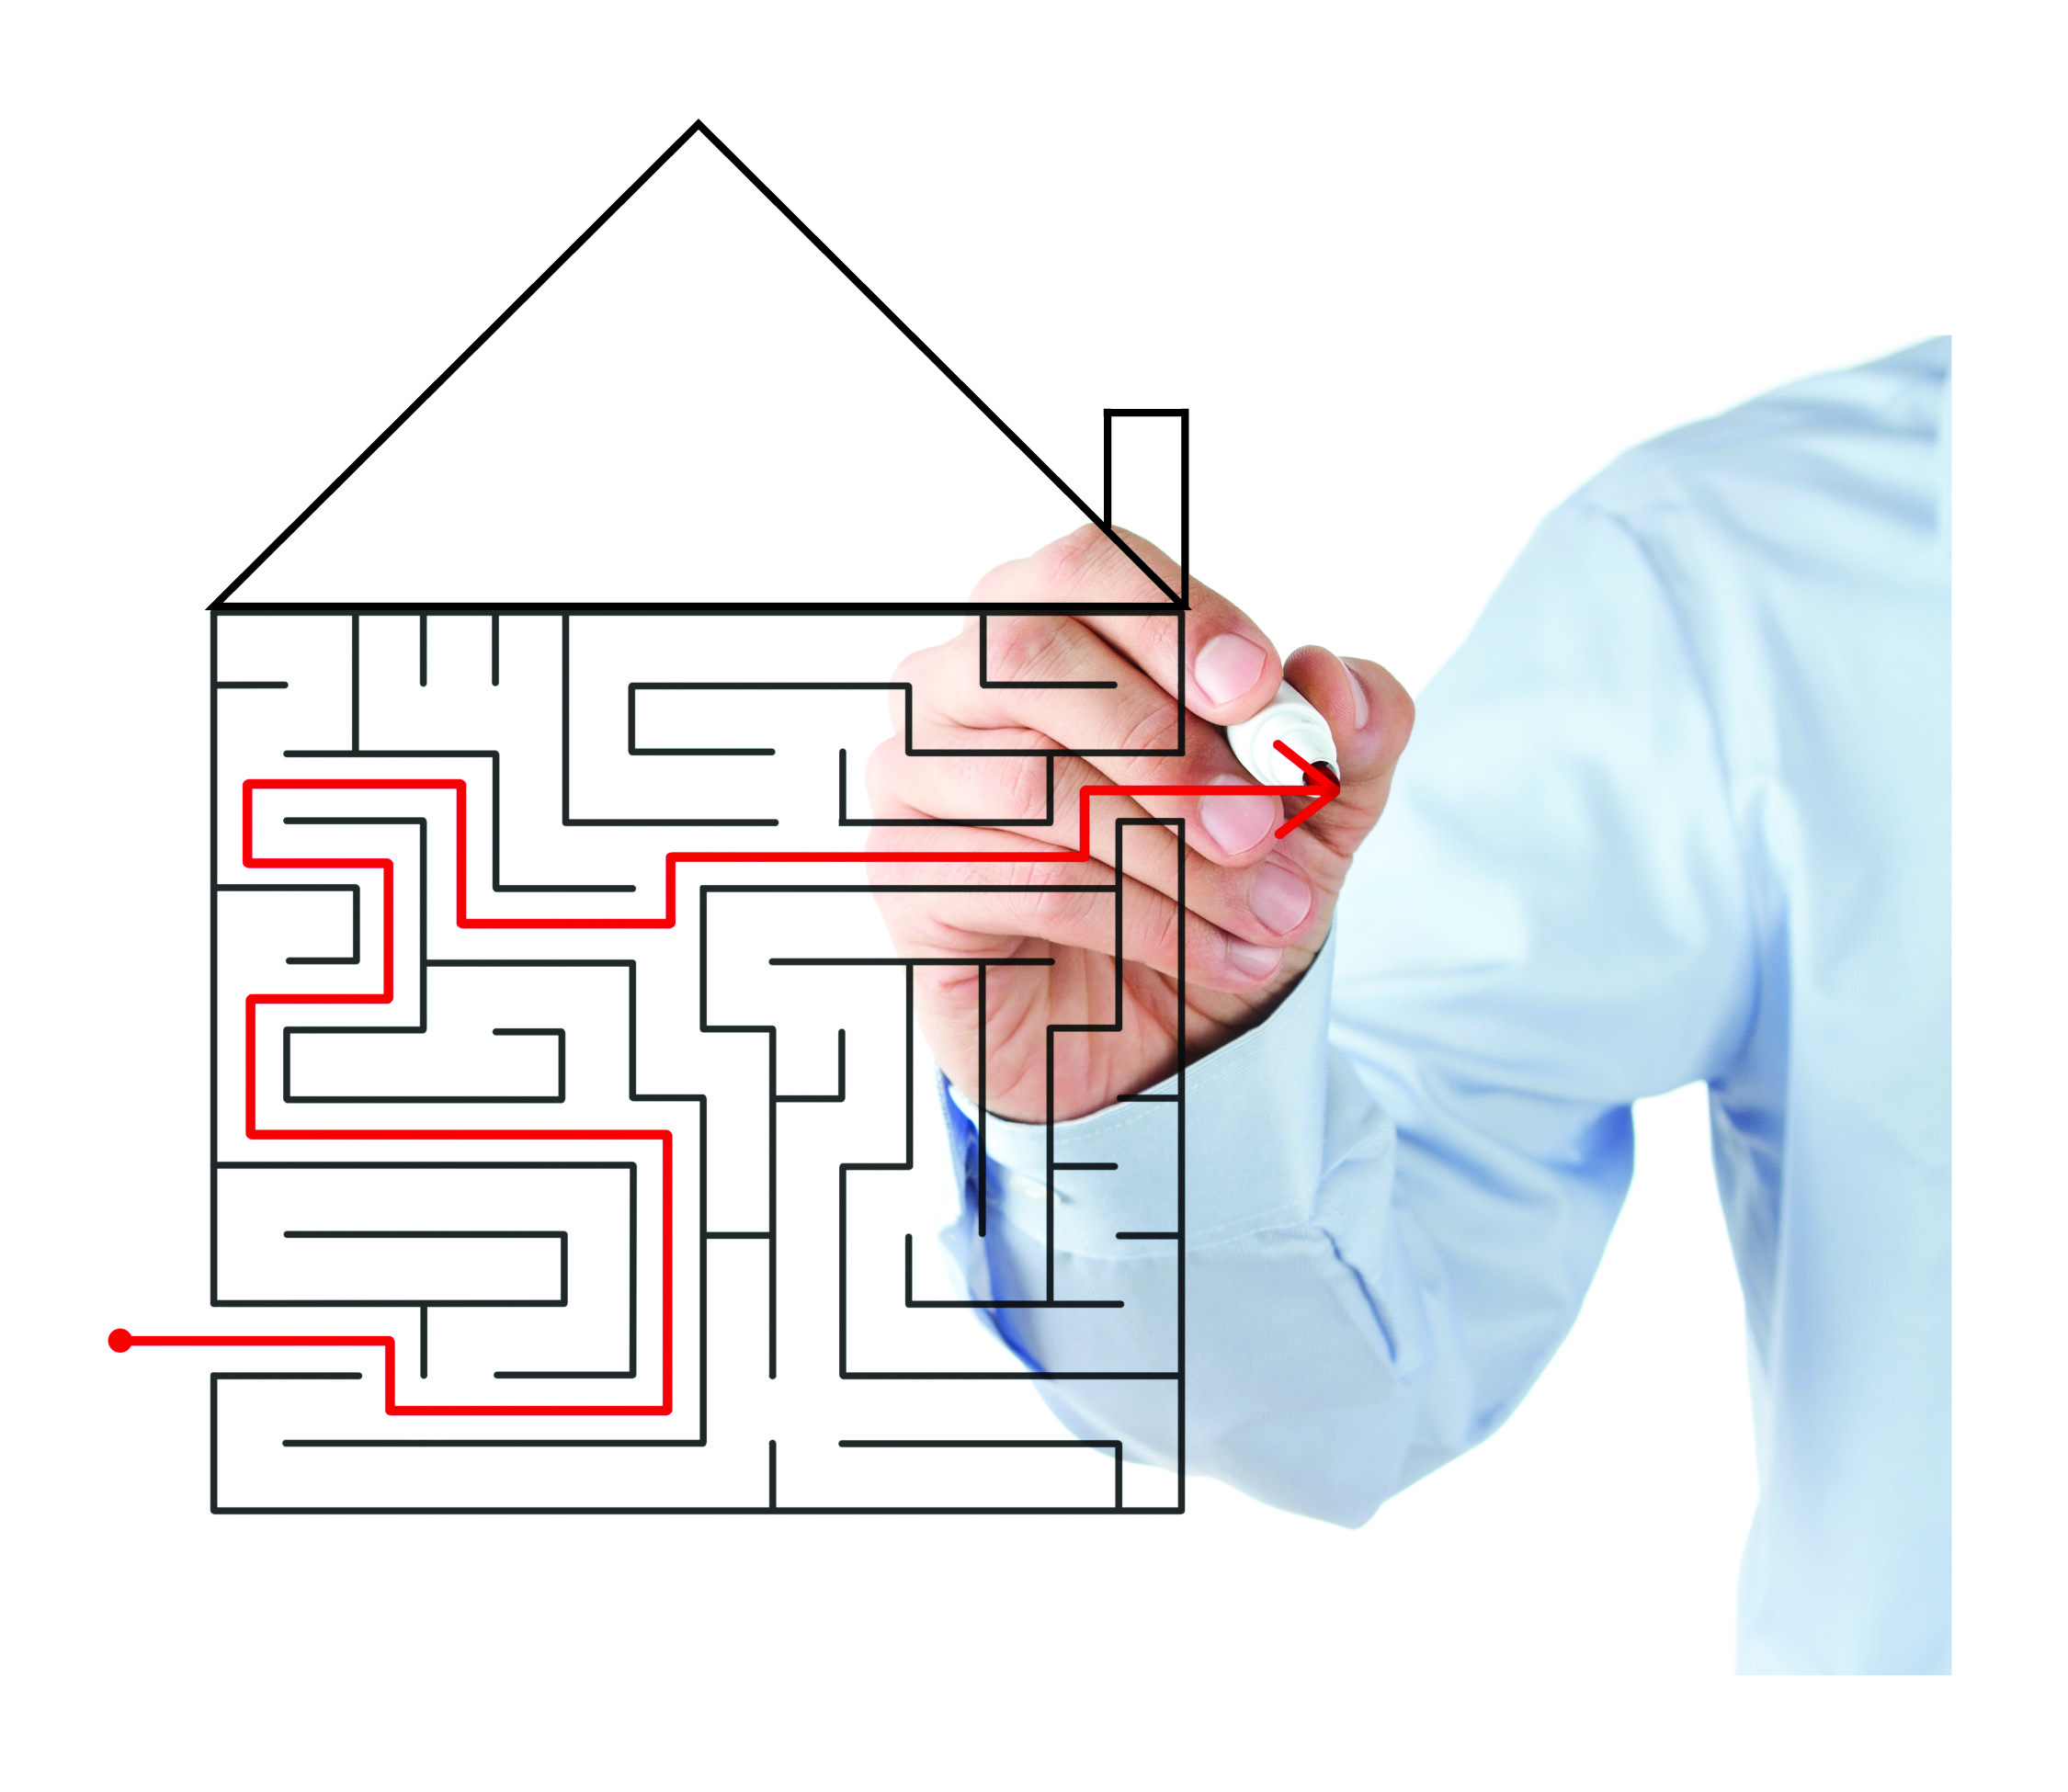 maze_house